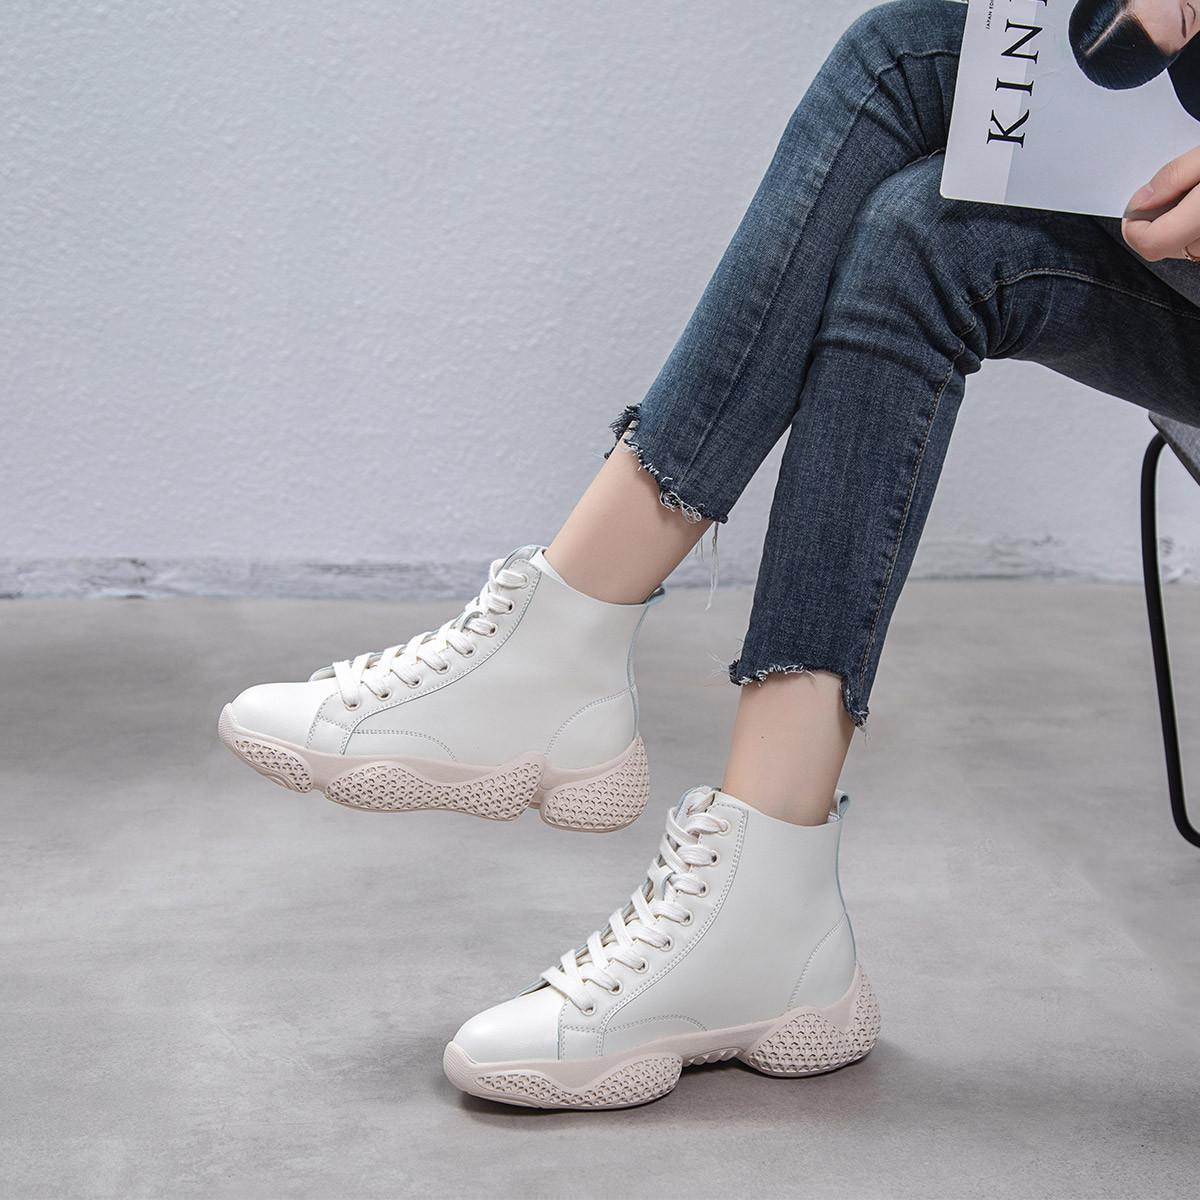 KALAILIER热卖爆款网红单靴韩版时尚百搭潮鞋厚底高帮老爹靴运动短靴KW0819029457